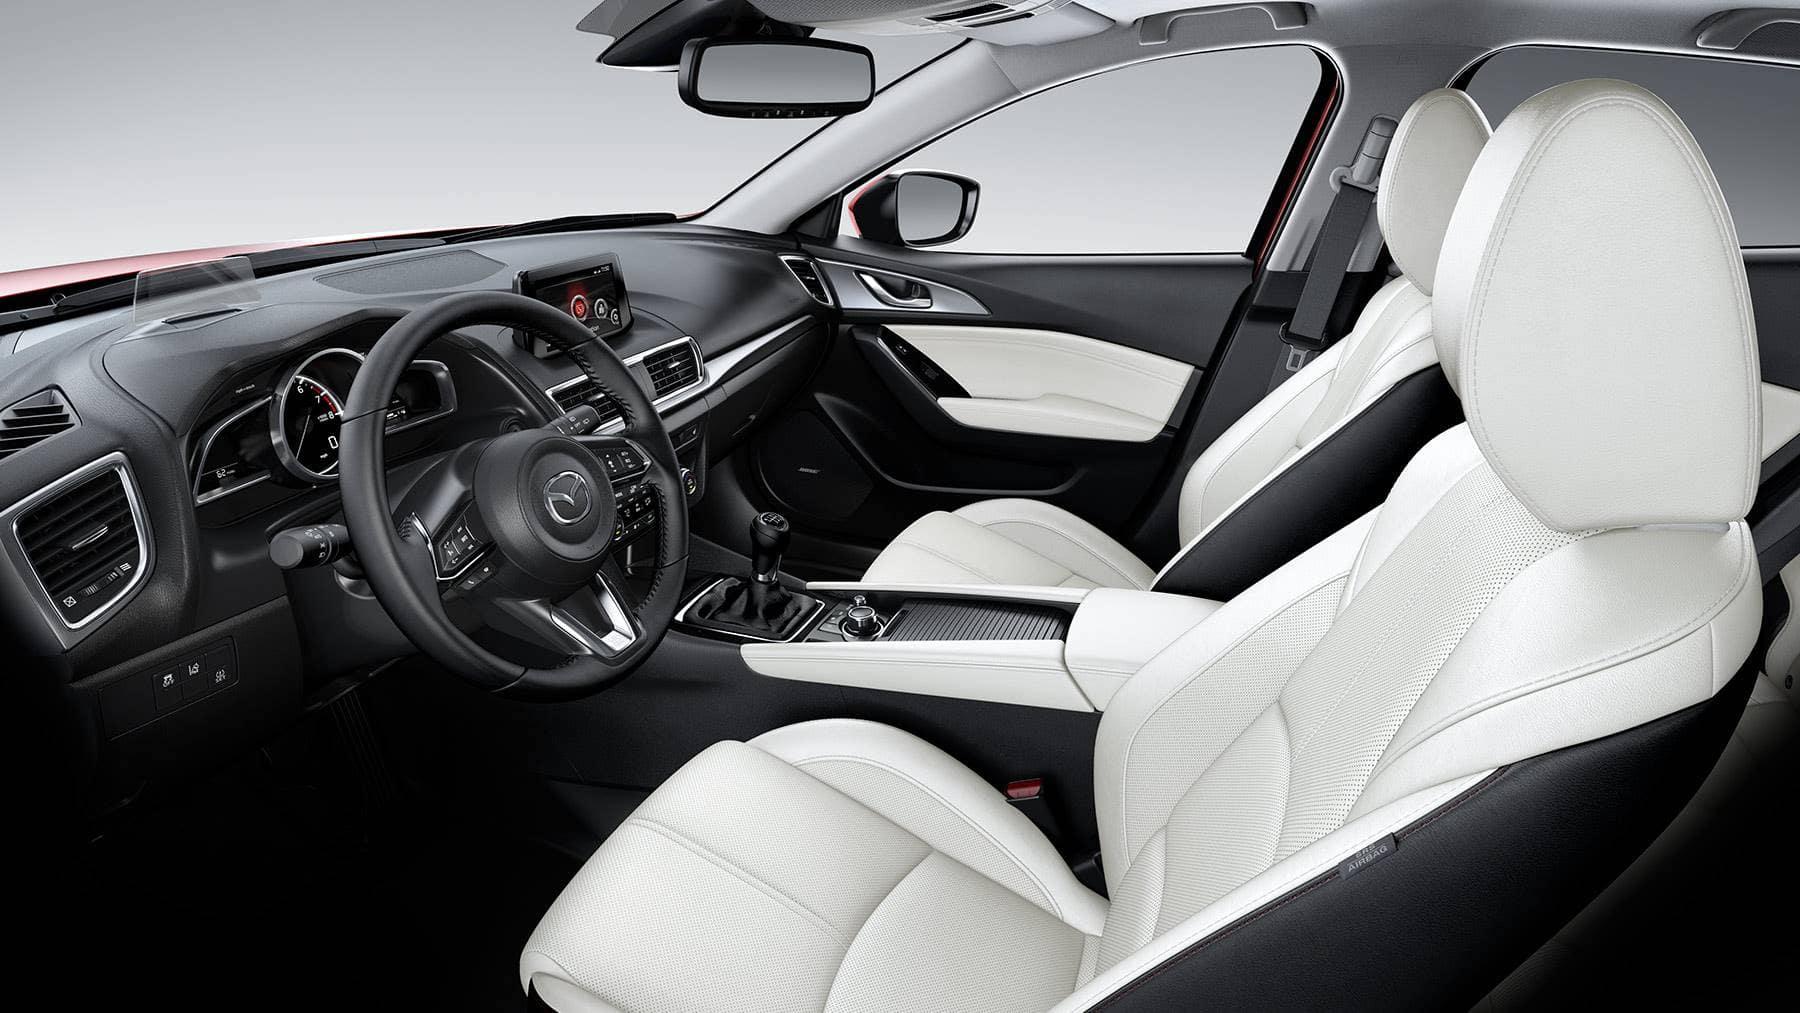 Chevy Cruze Vs Mazda3 Compact Hatchback And Sedan Showdown